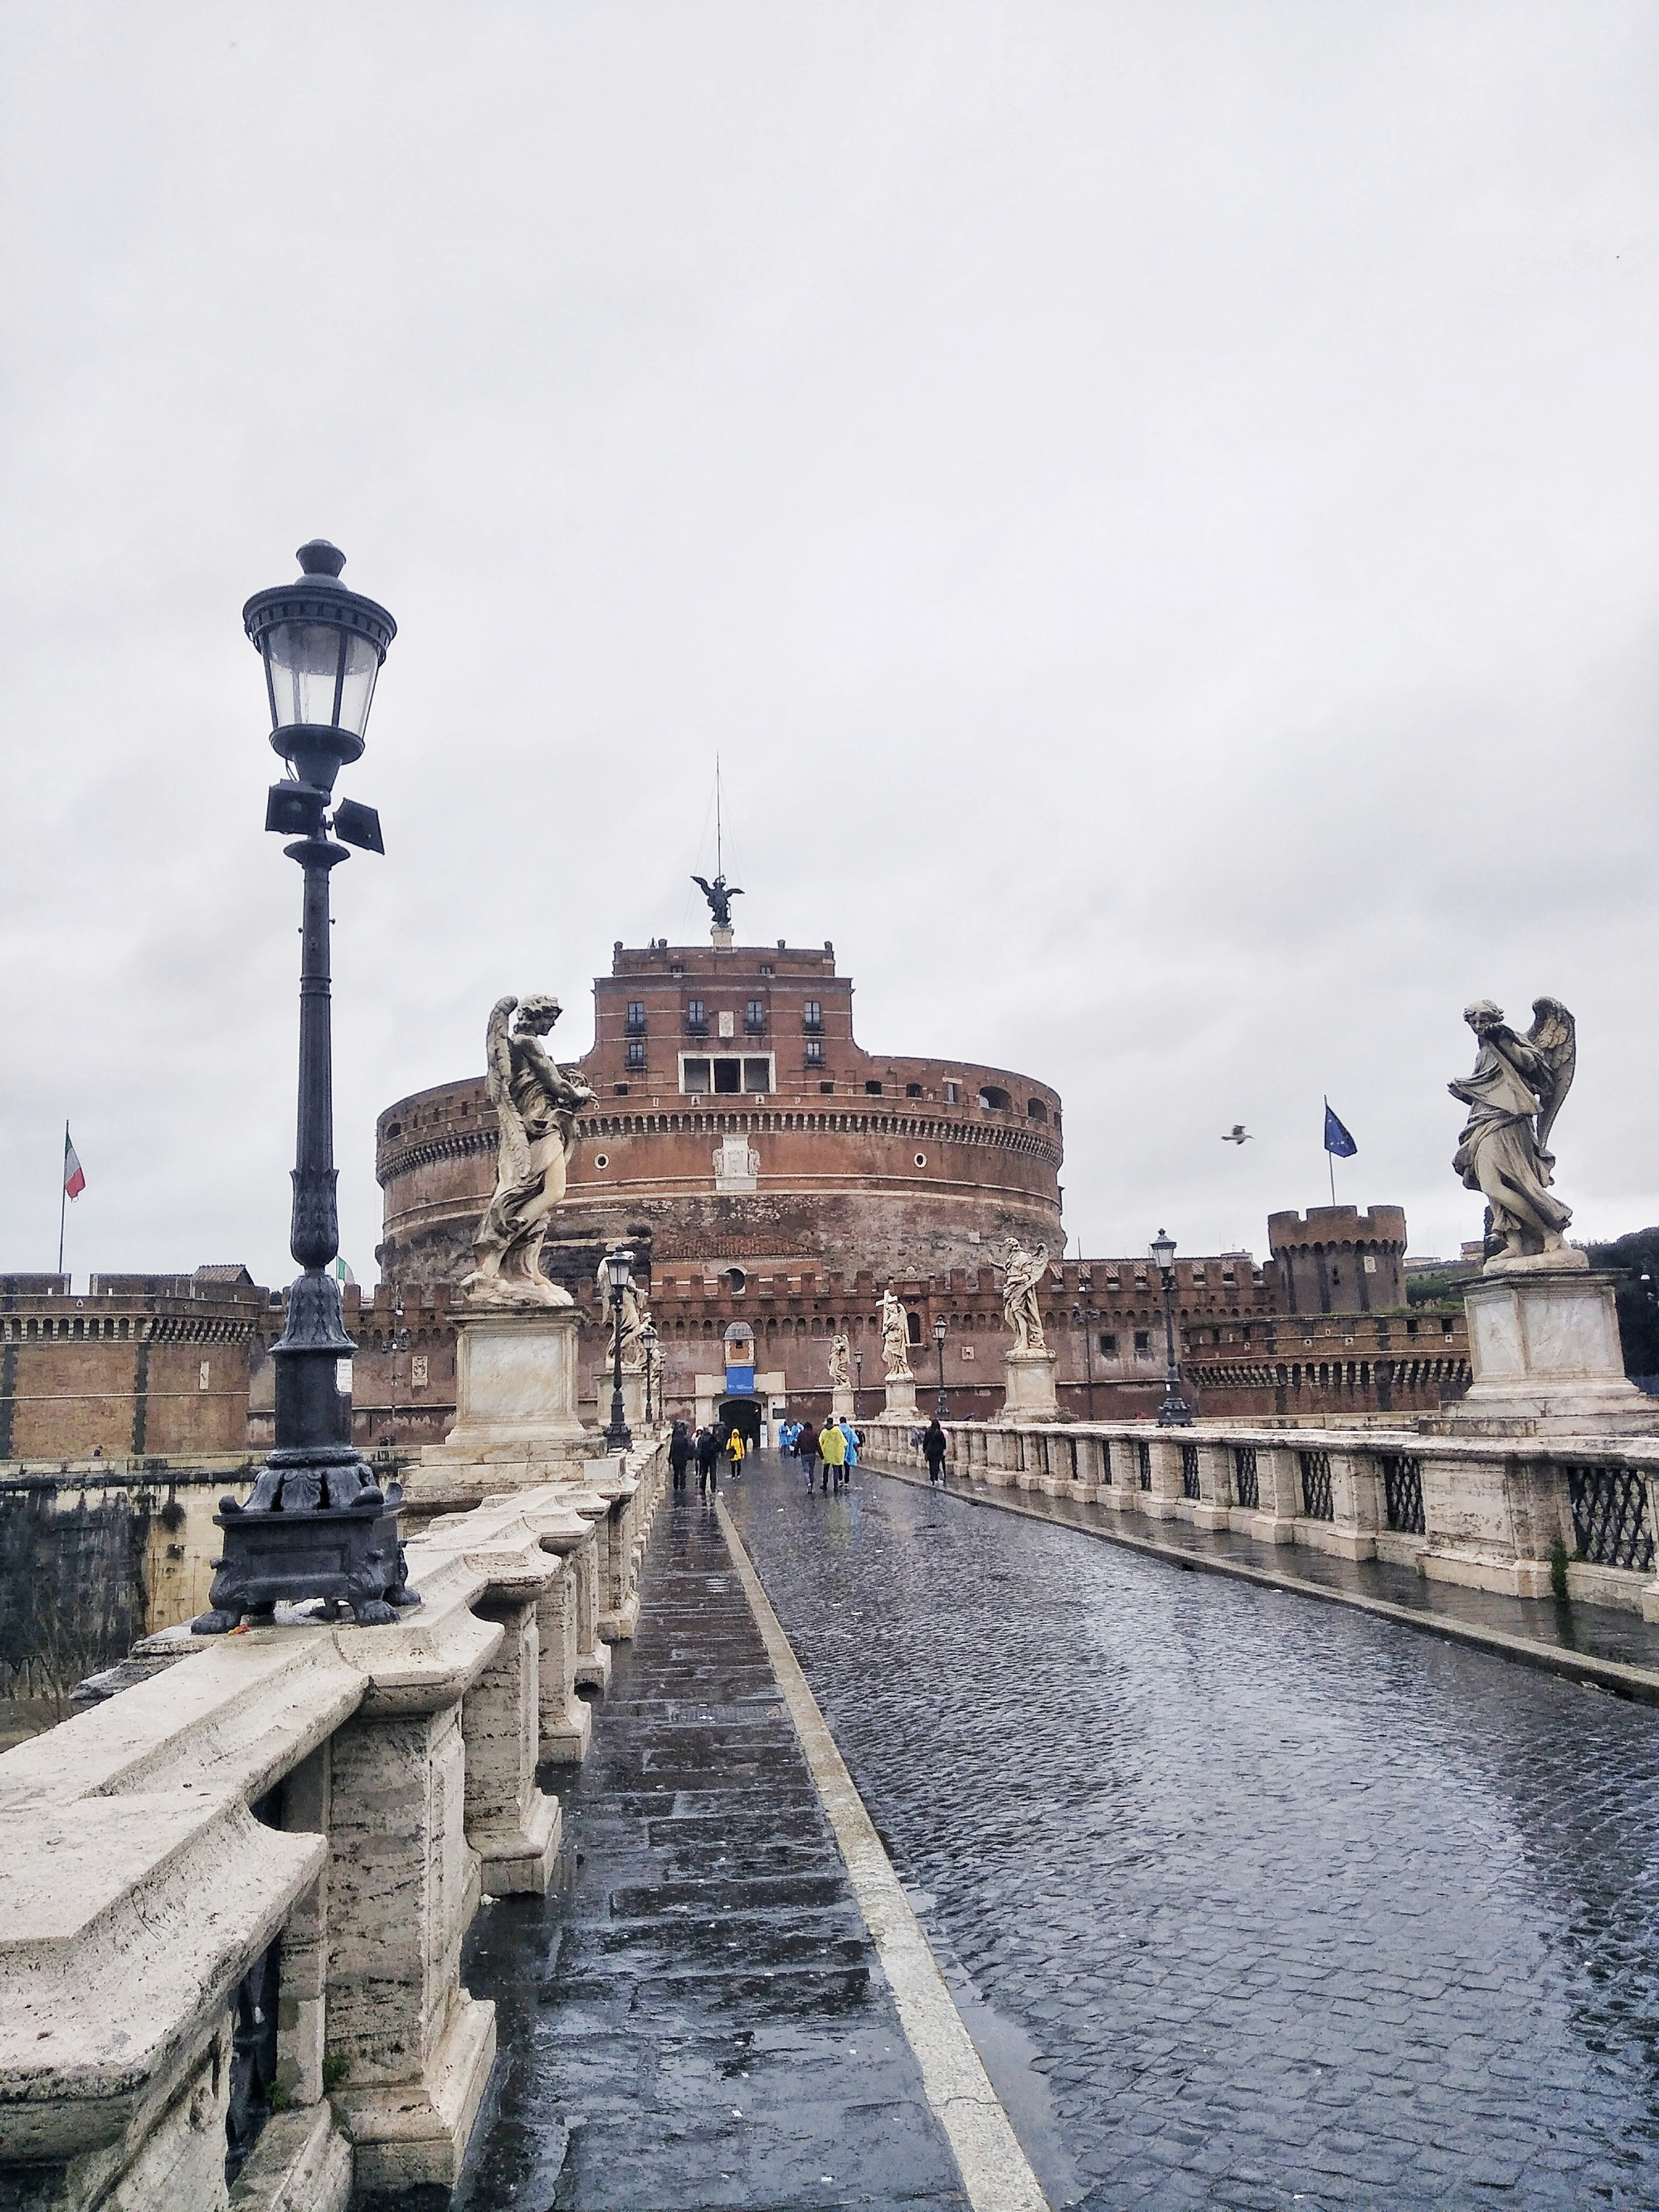 Рим: взгляд на Вечный город под другим углом Рим: взгляд на Вечный город под другим углом IMG 20180409 145803 01